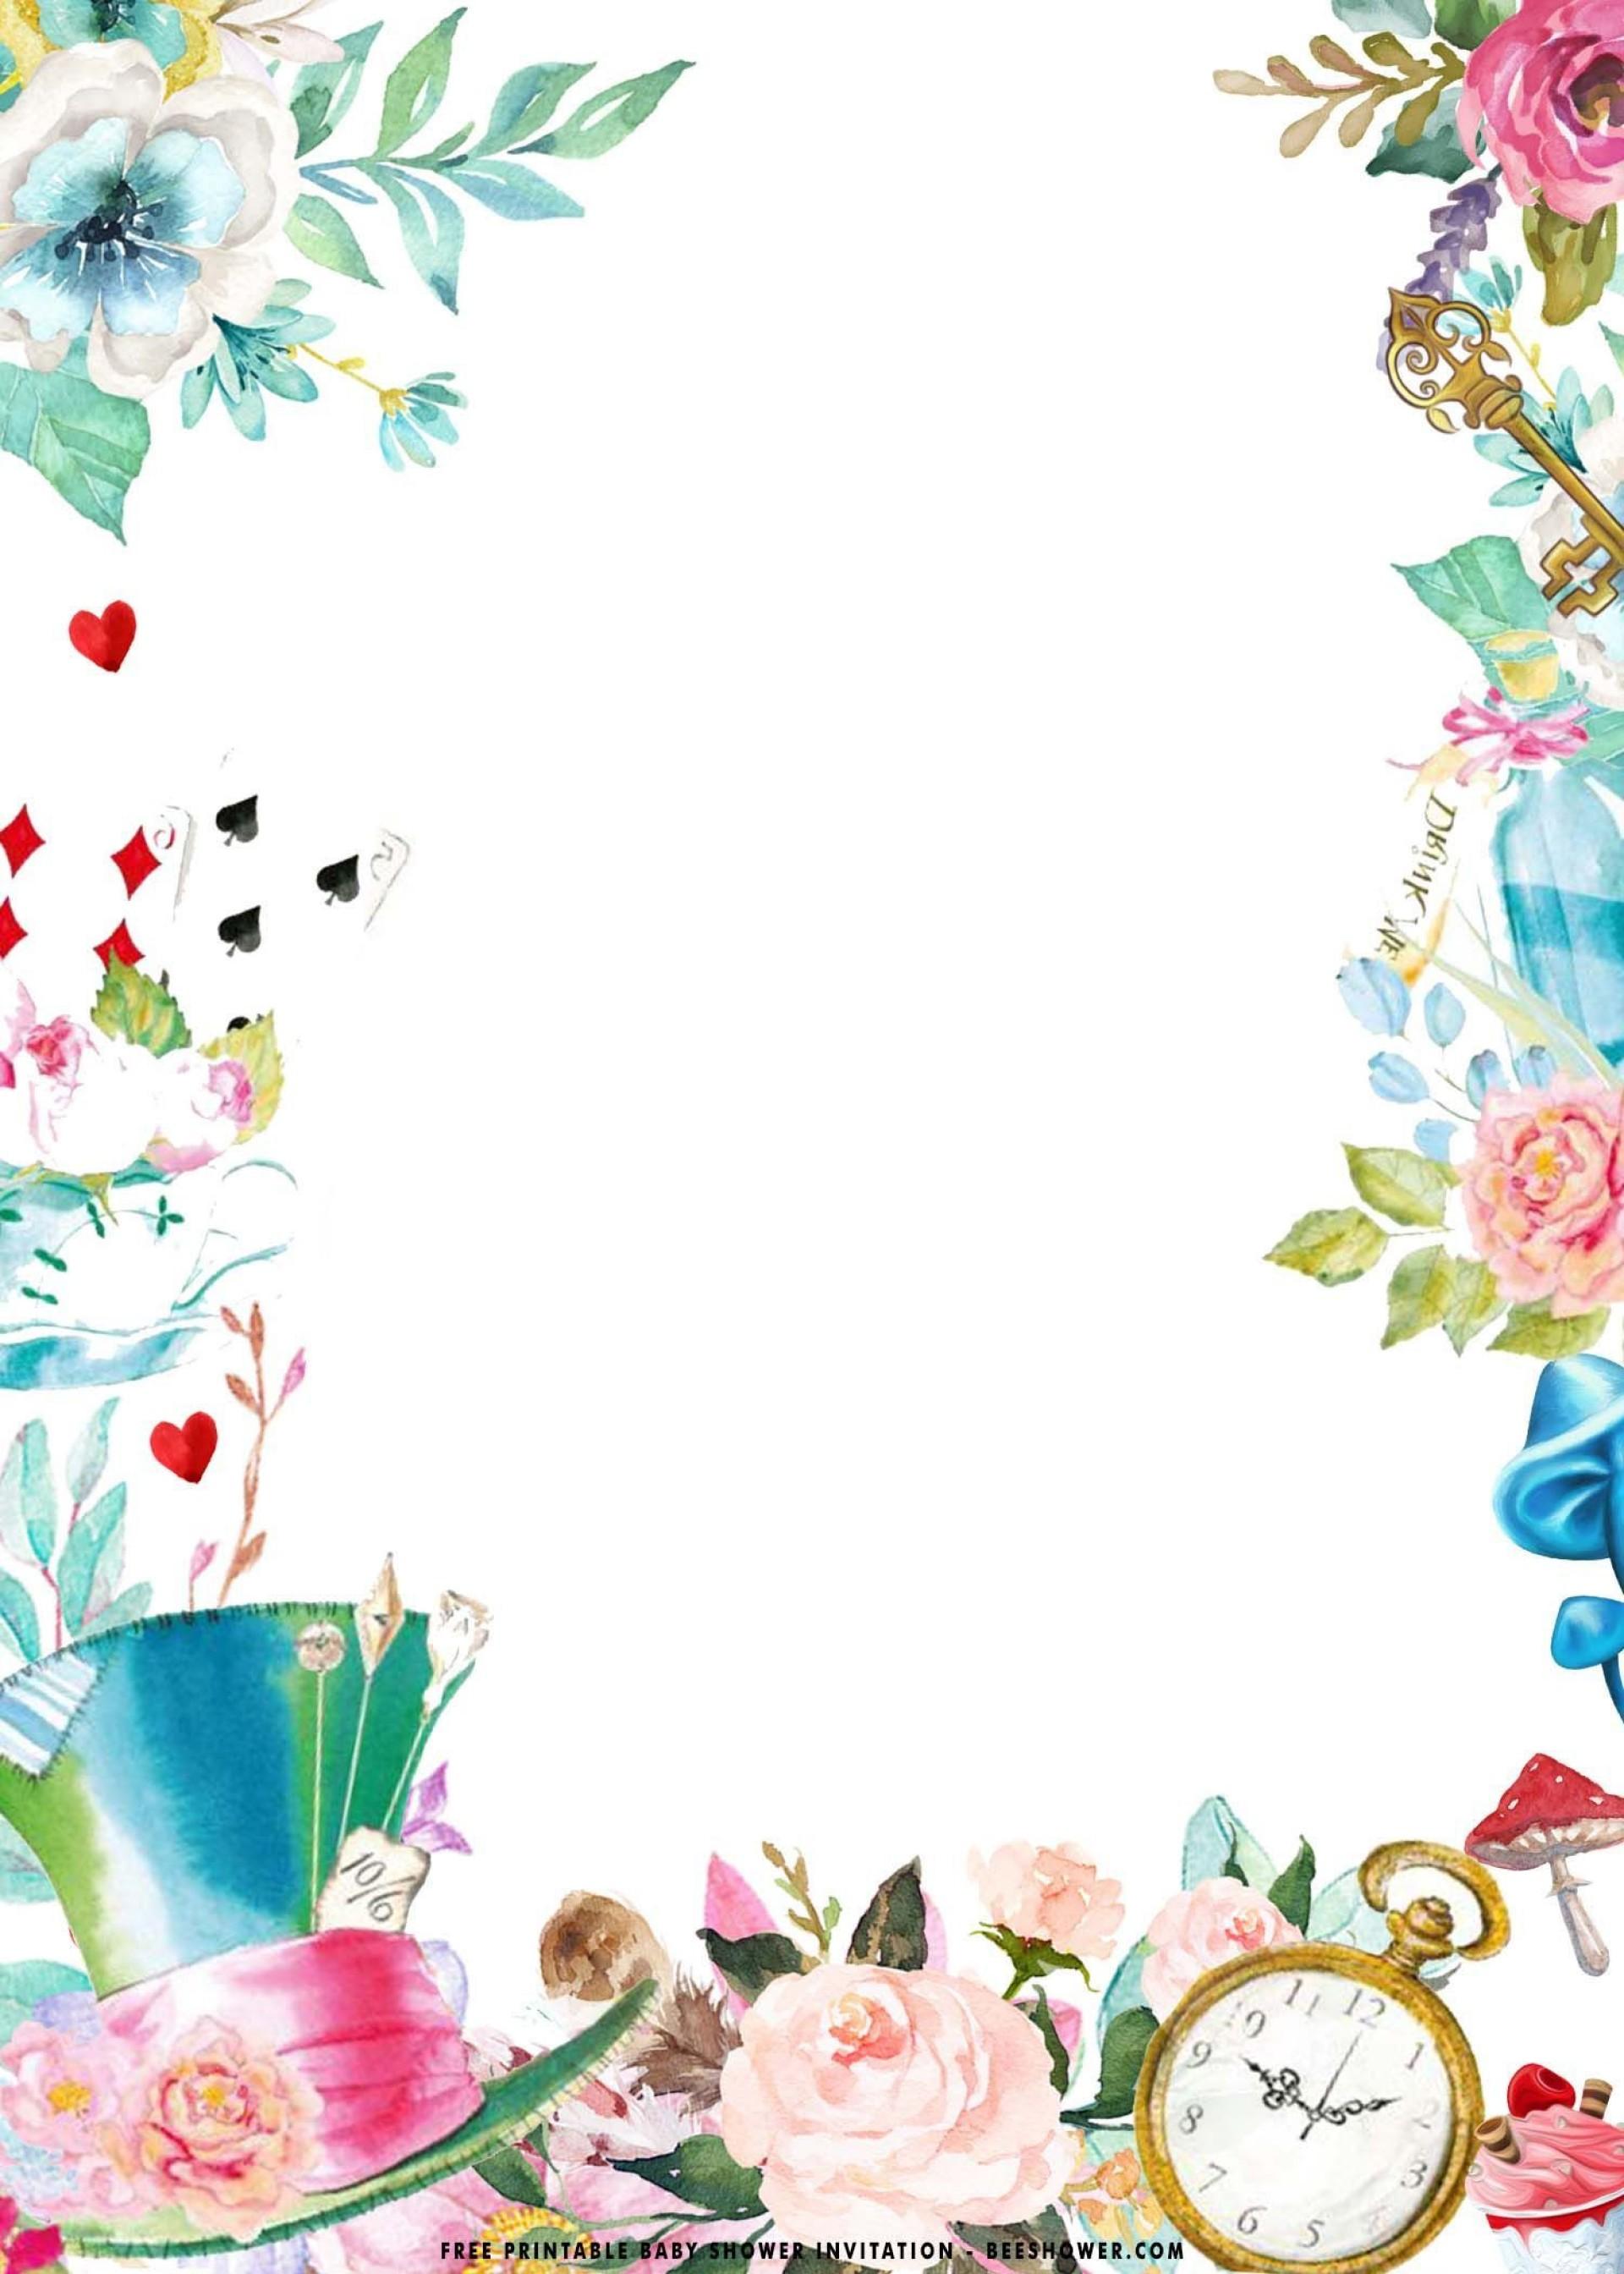 002 Fascinating Alice In Wonderland Birthday Party Invitation Printable Free Design 1920